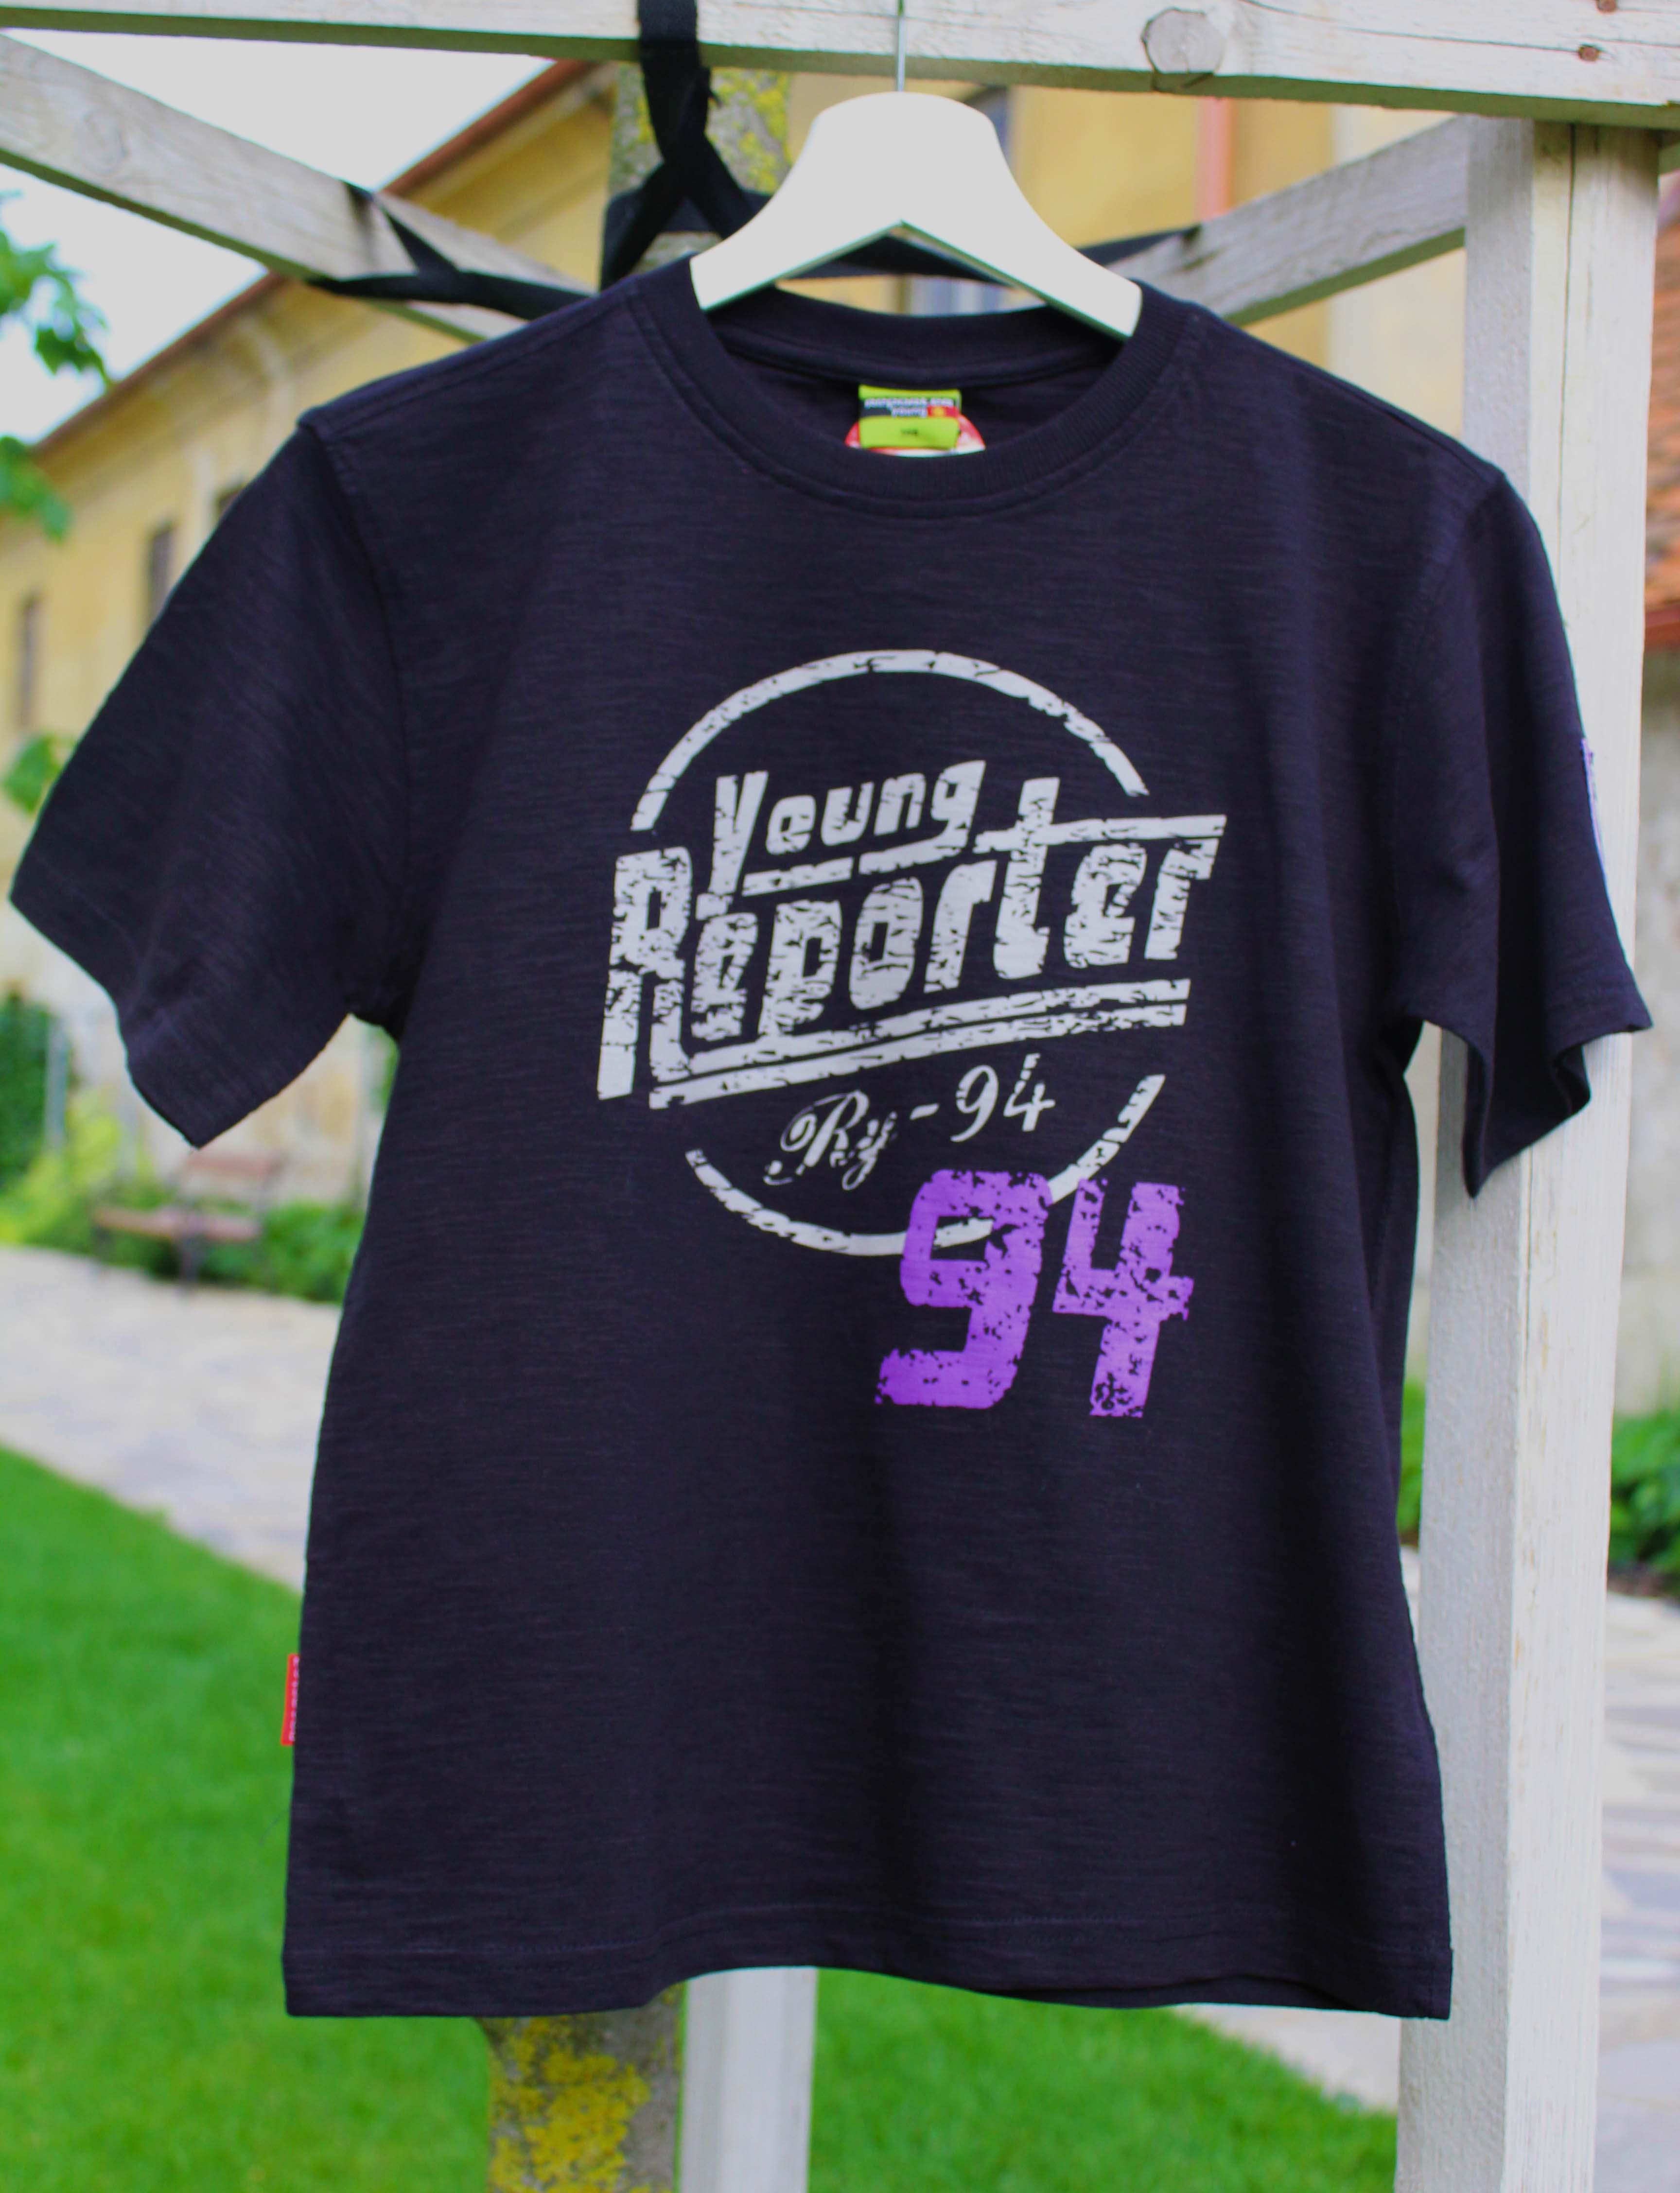 1c879c8a4a8d chlapčenské tričko REPORTER 94